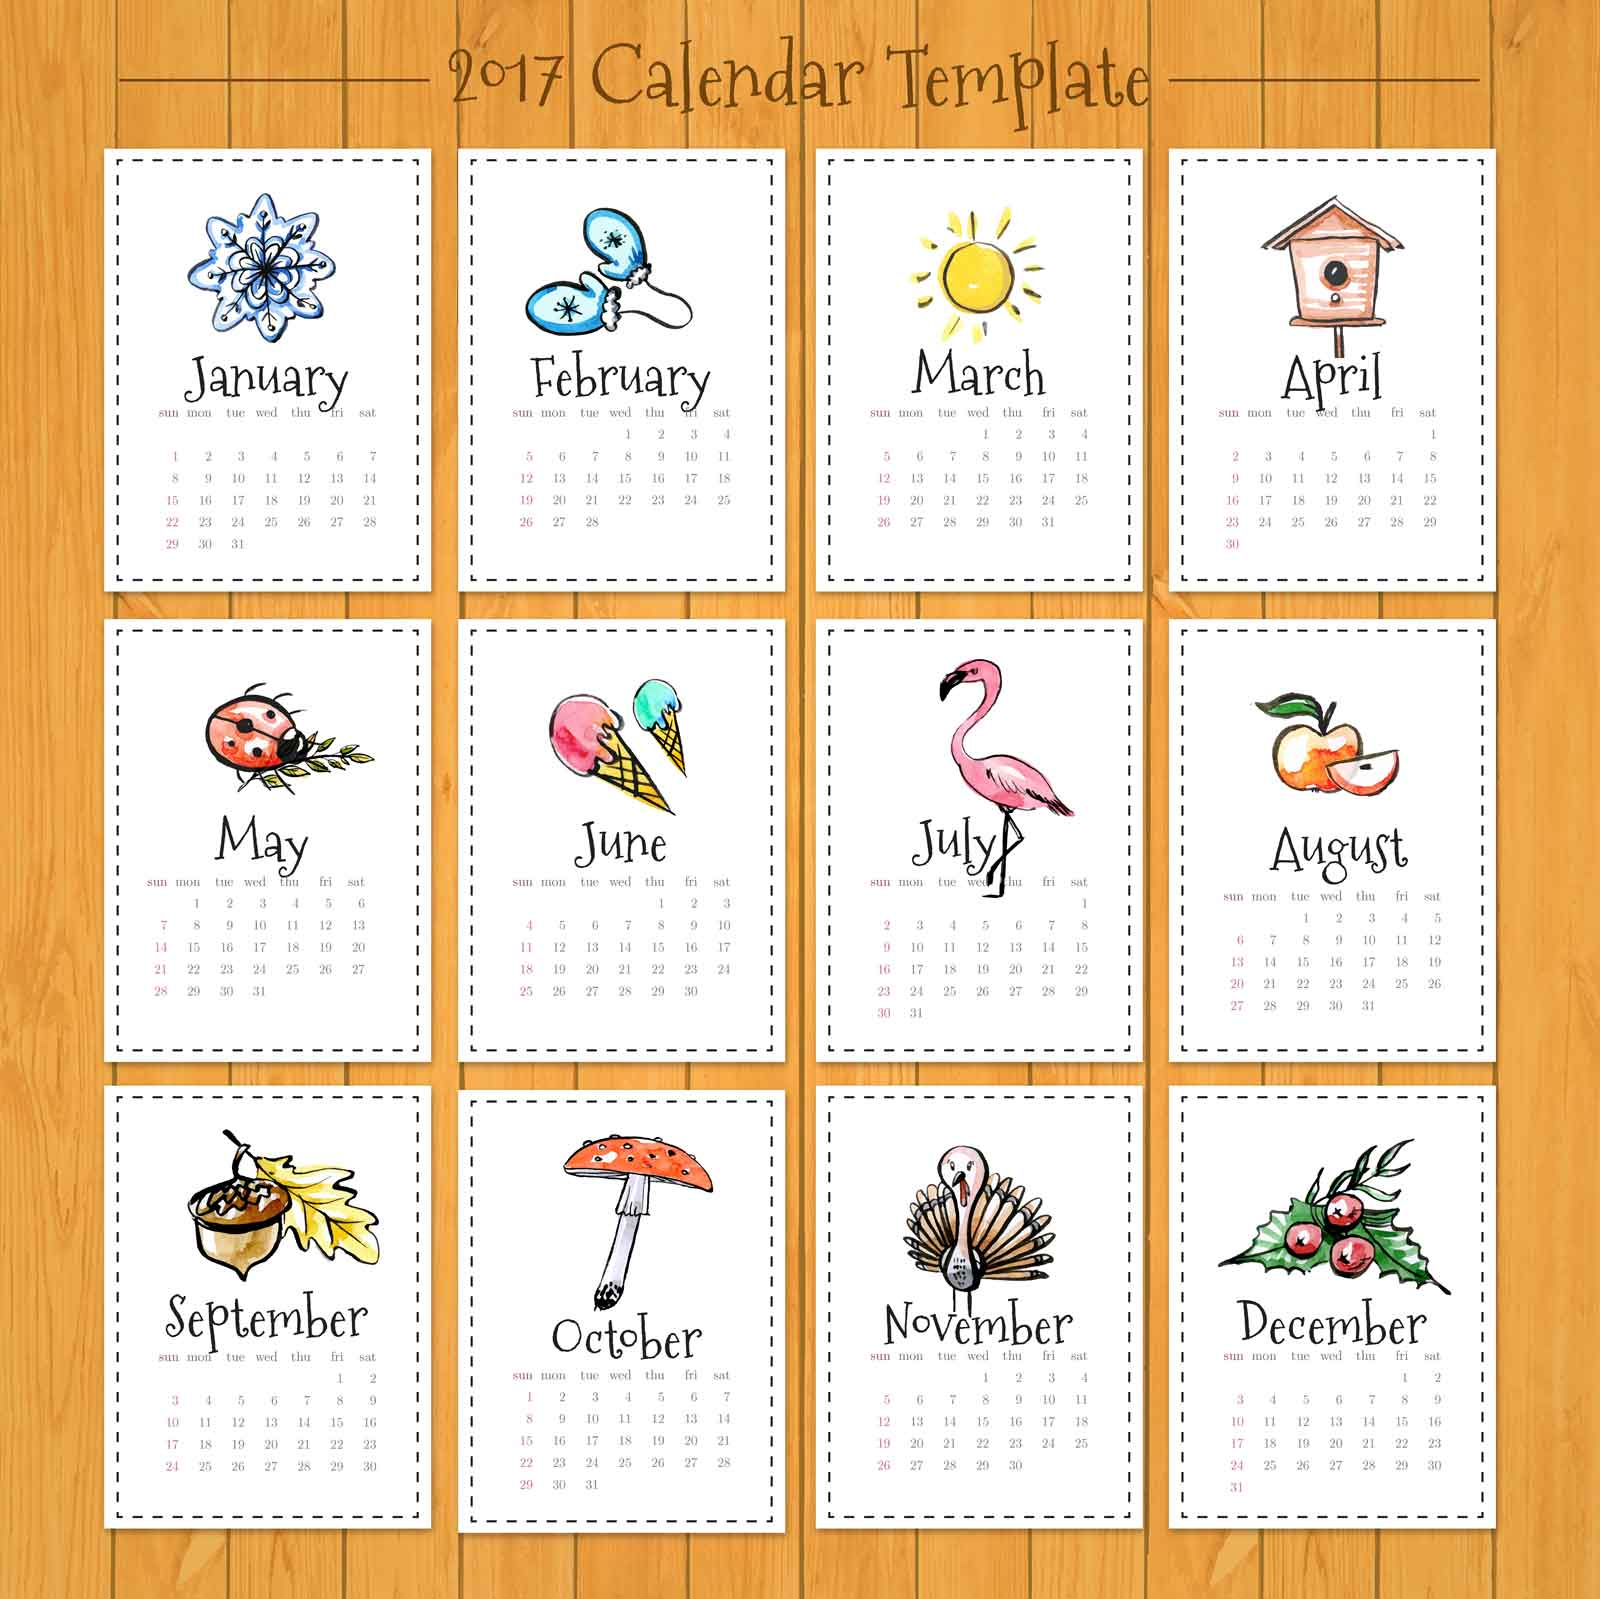 Calendar Drawing Design : カレンダー無料テンプレート きゃんつくばっと